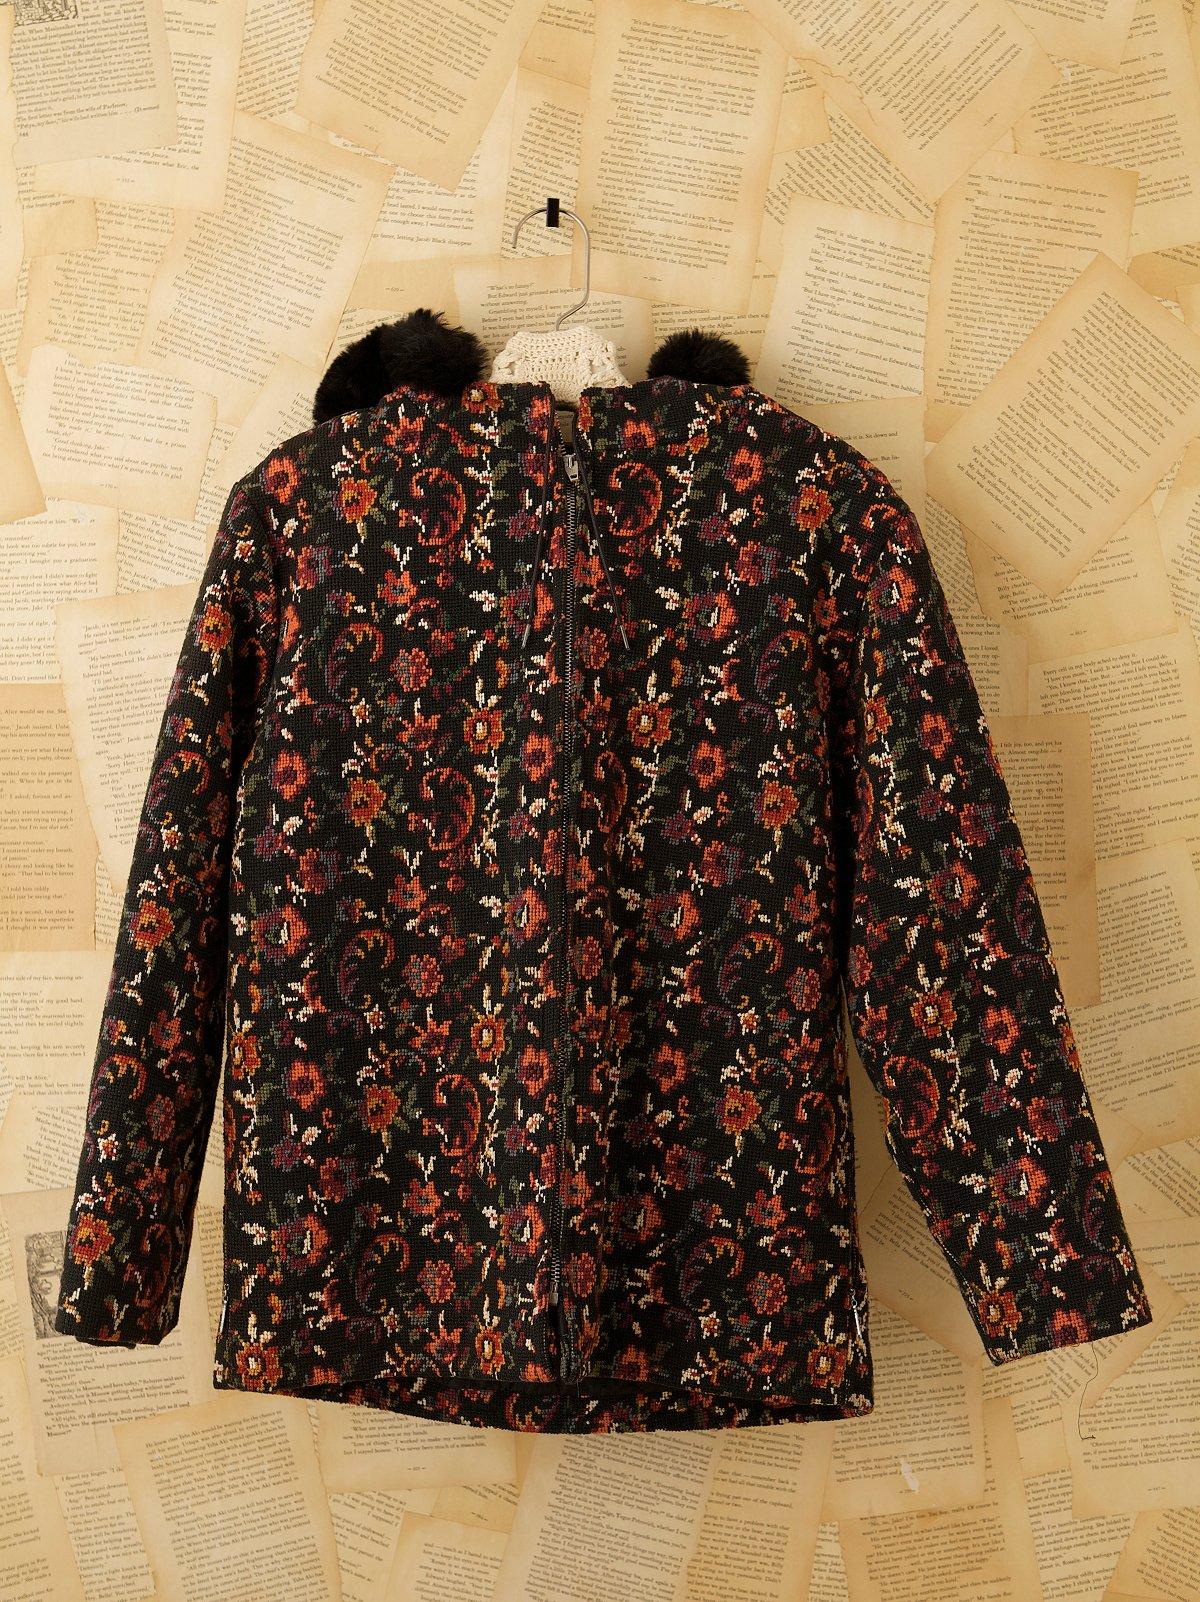 Vintage 60s Needlepoint Jacket